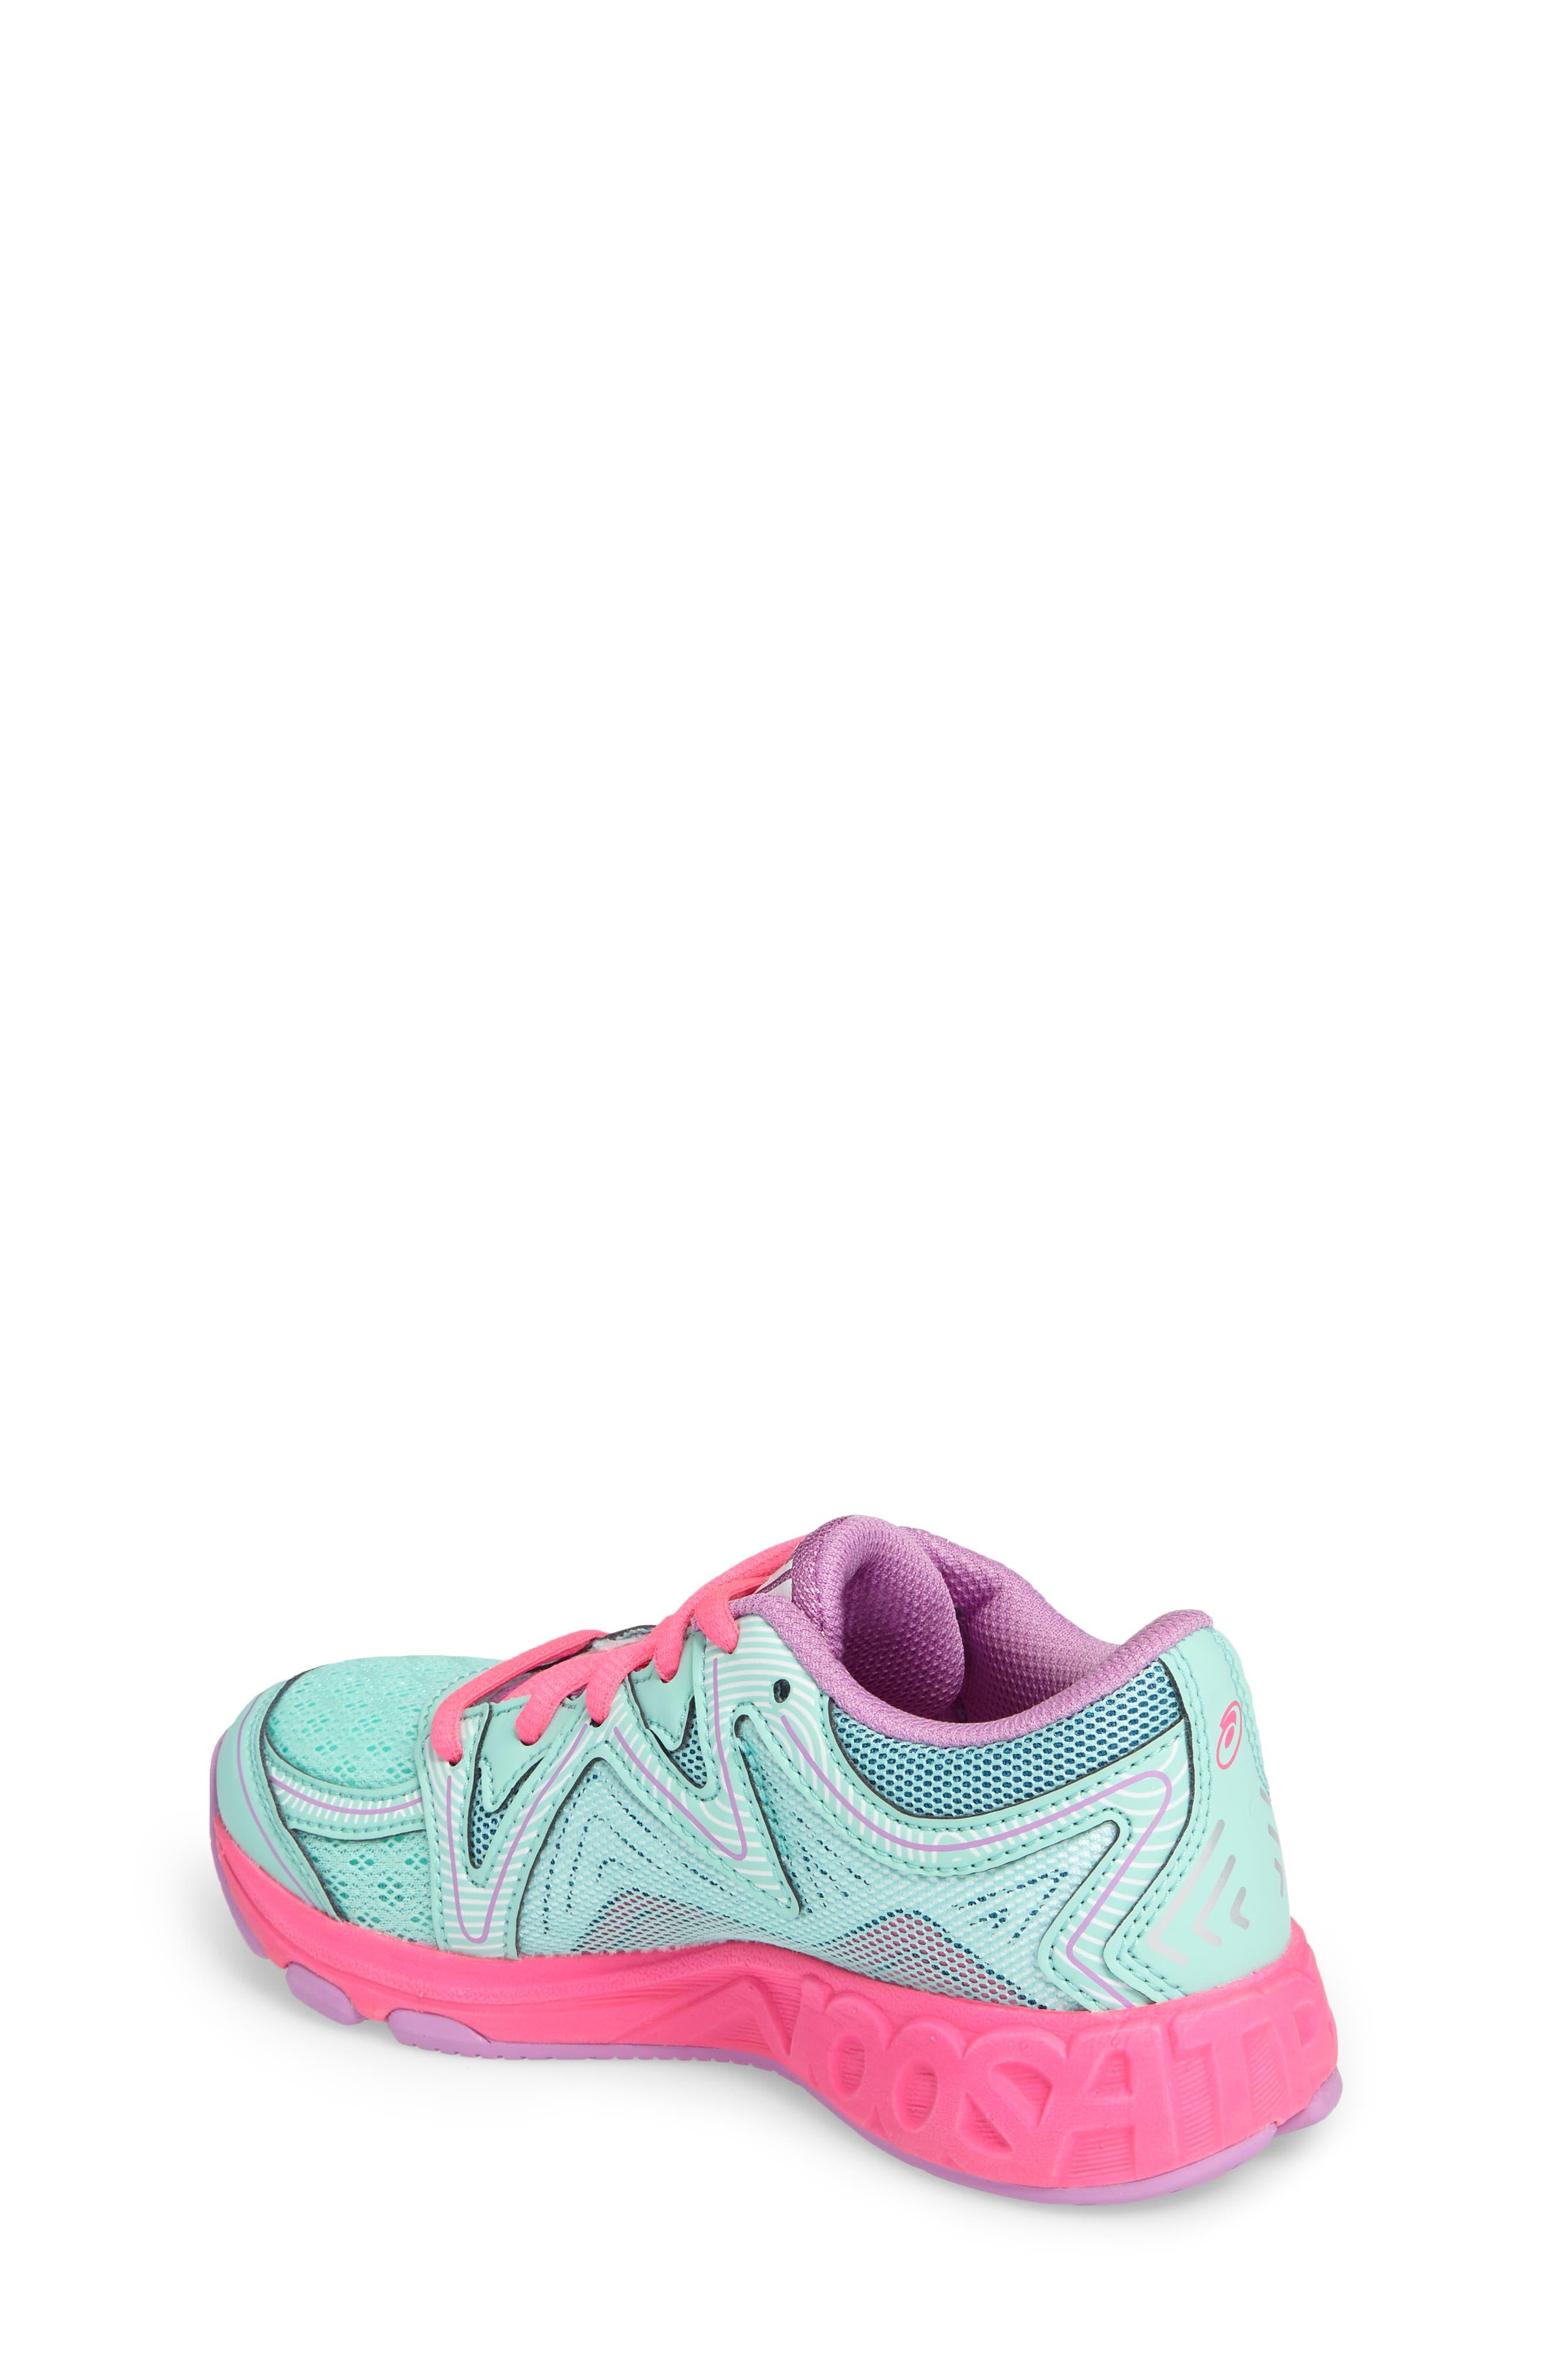 Noosa GS Sneaker,                             Alternate thumbnail 2, color,                             330